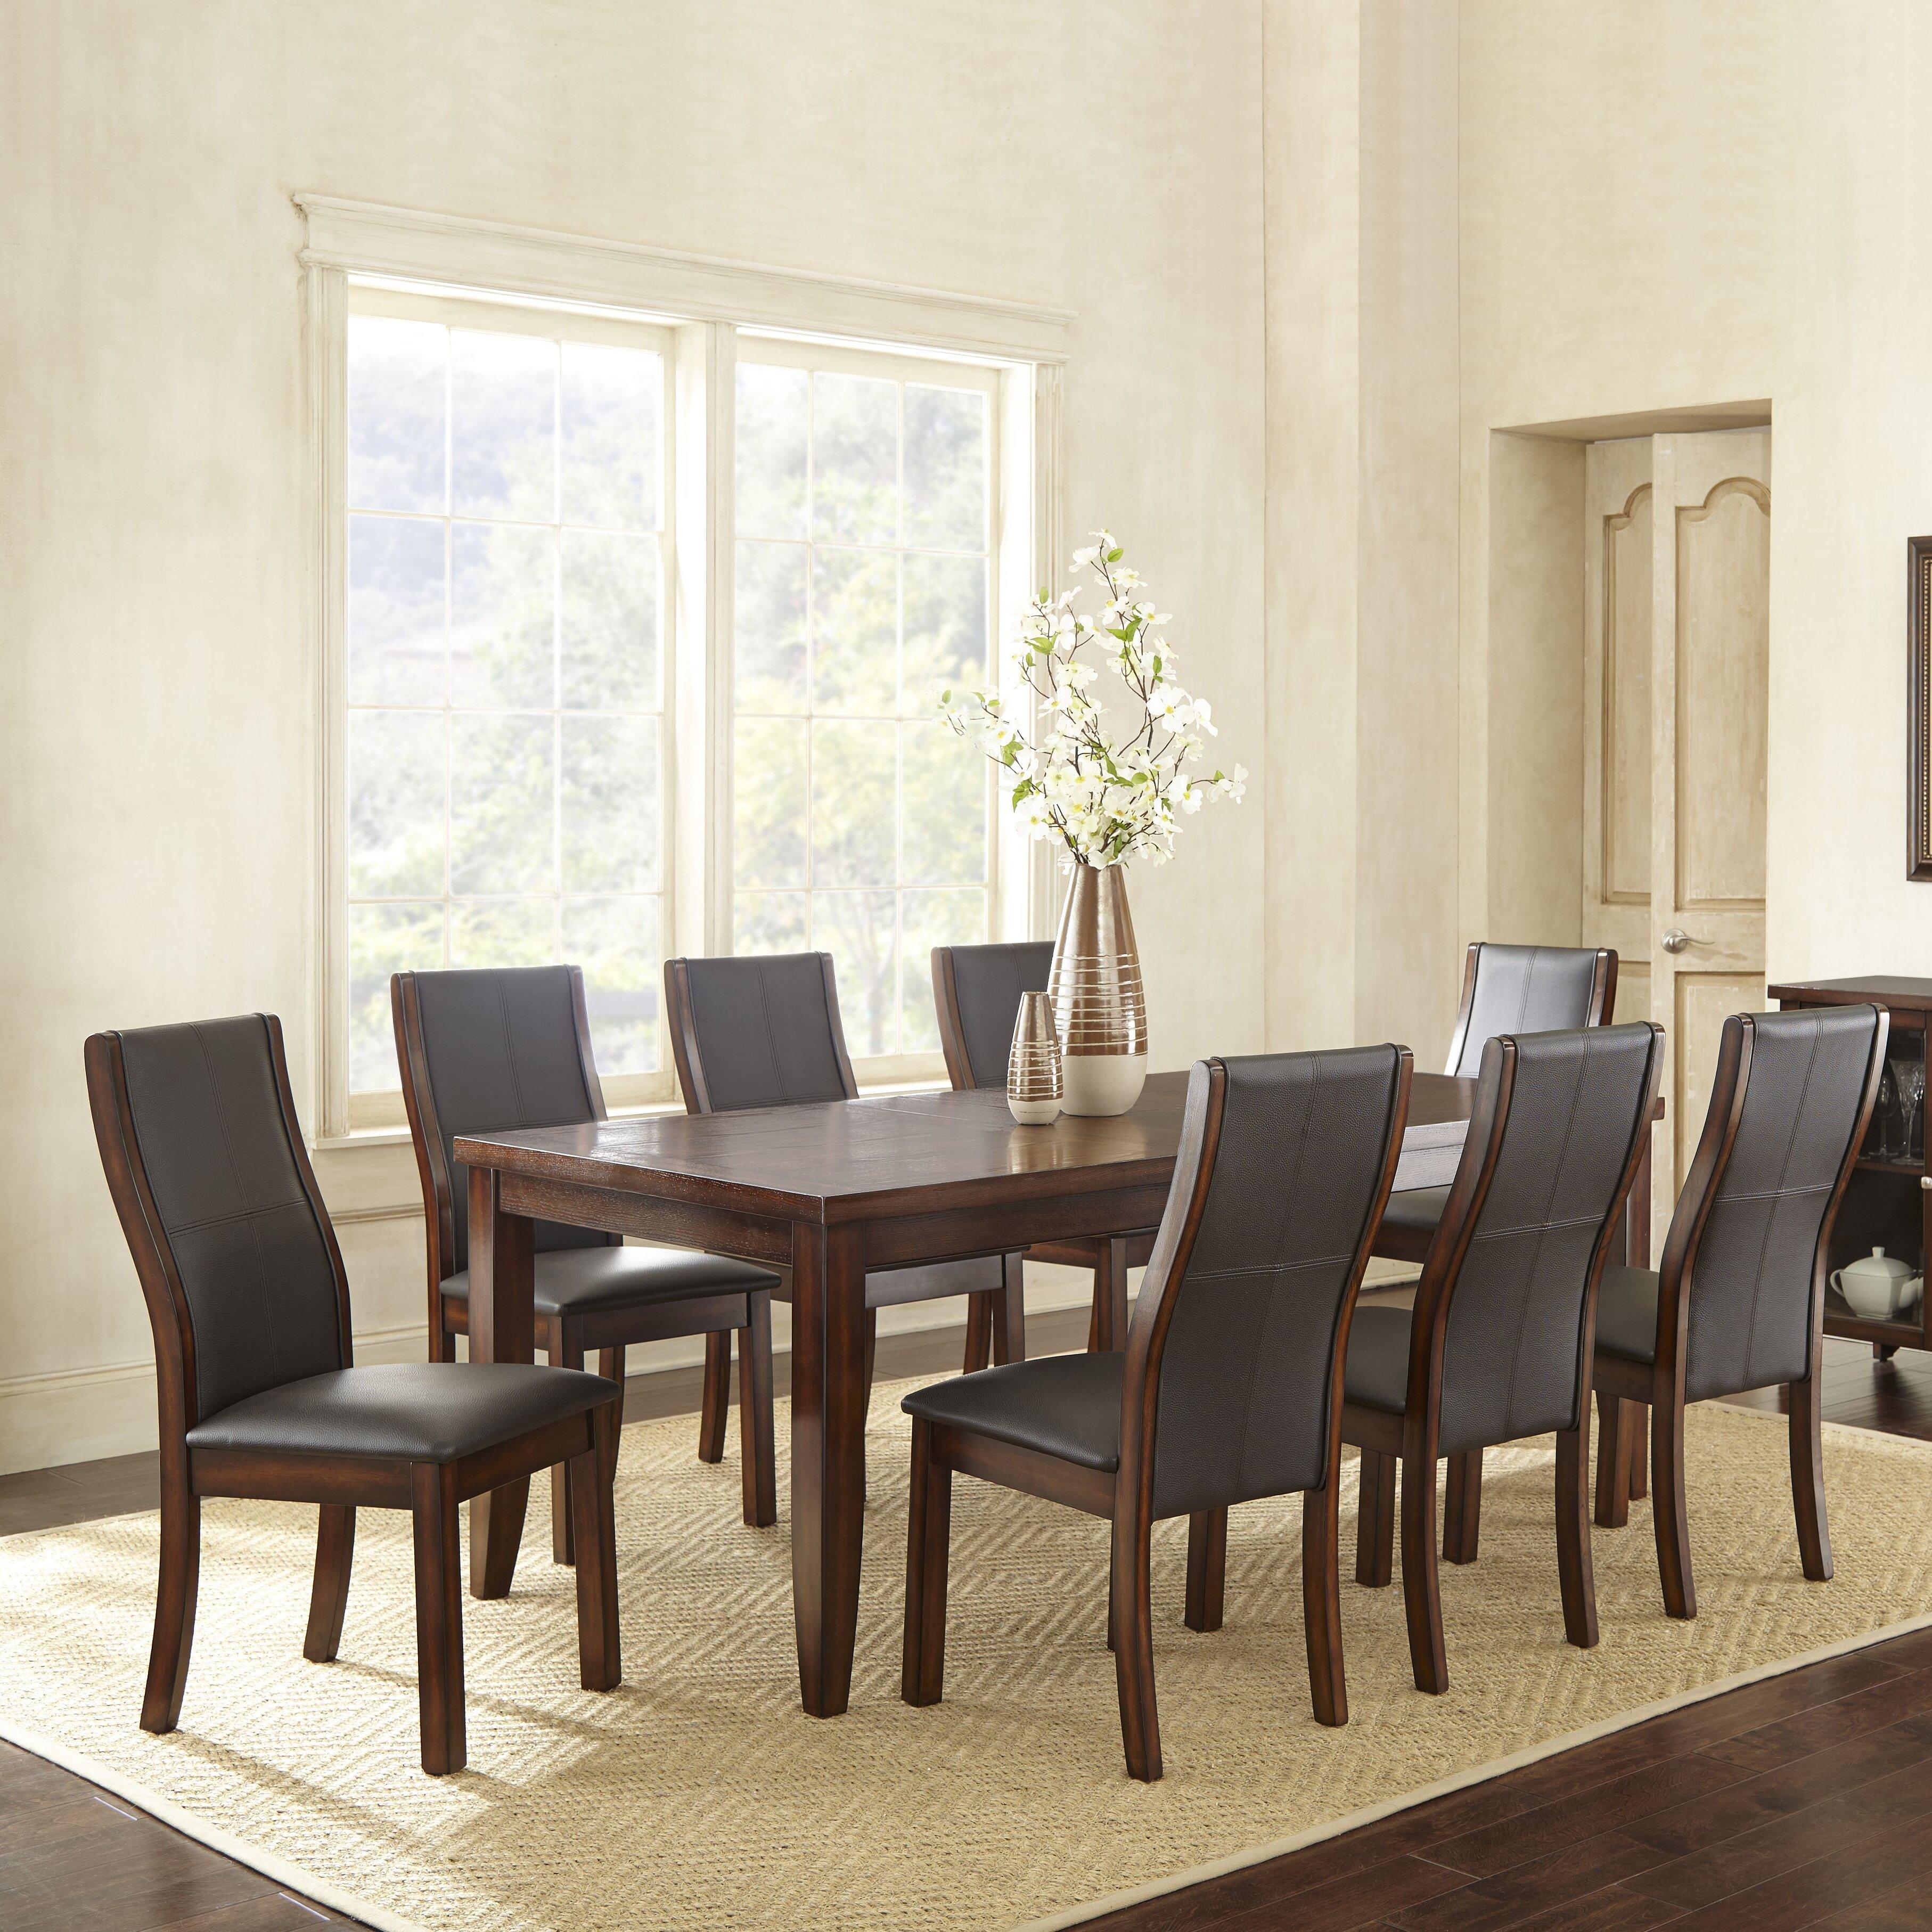 Steve Silver Leona 9 Piece Dining Table Set: Steve Silver Furniture Xander 9 Piece Extendable Dining